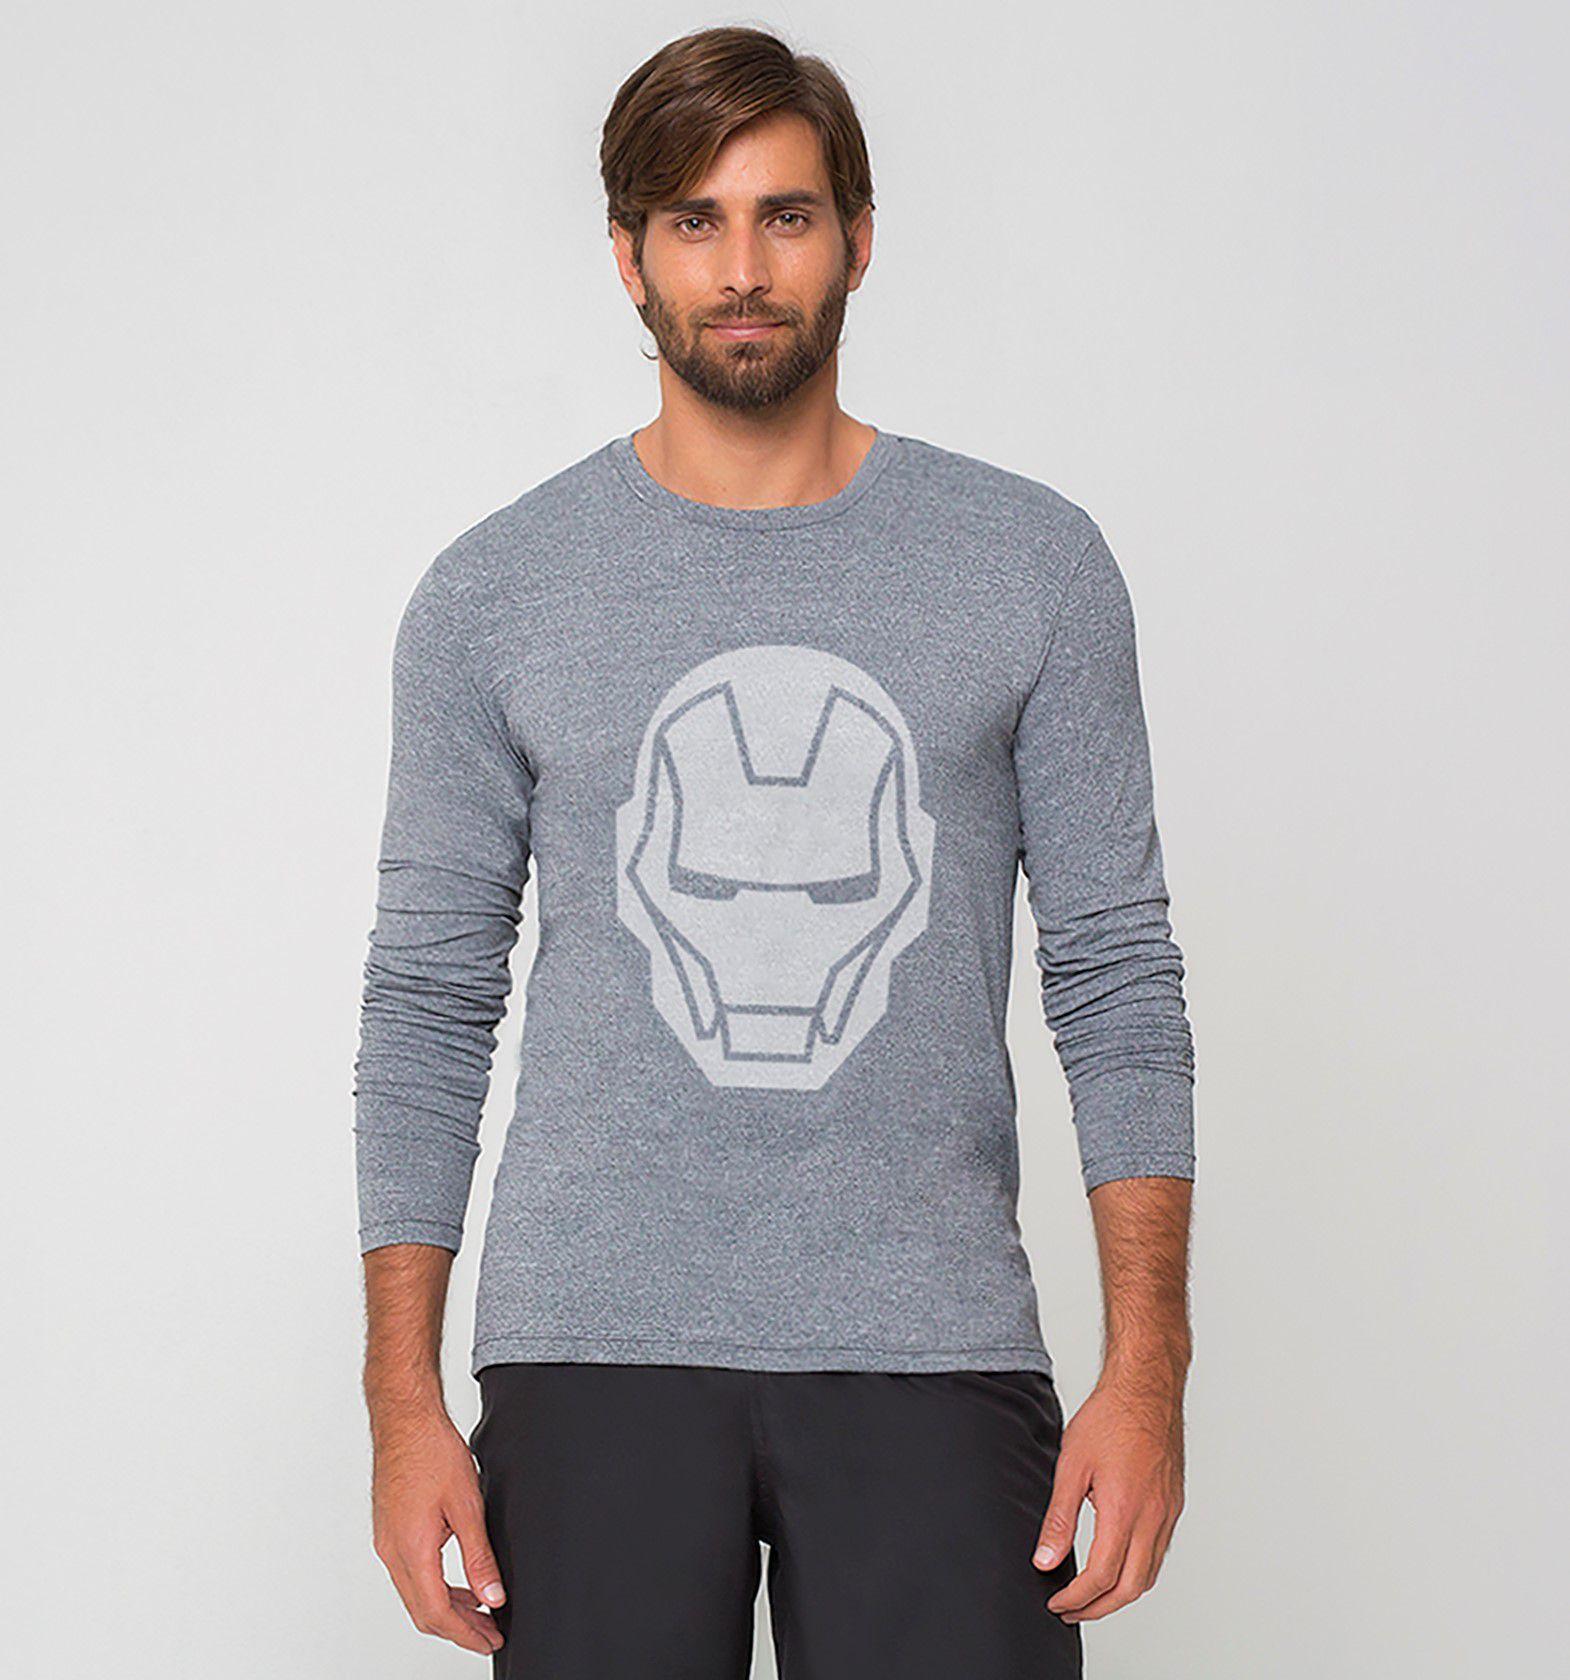 UV LINE Camiseta Masculina Sport Fit Manga Longa Estampa Proteção Solar